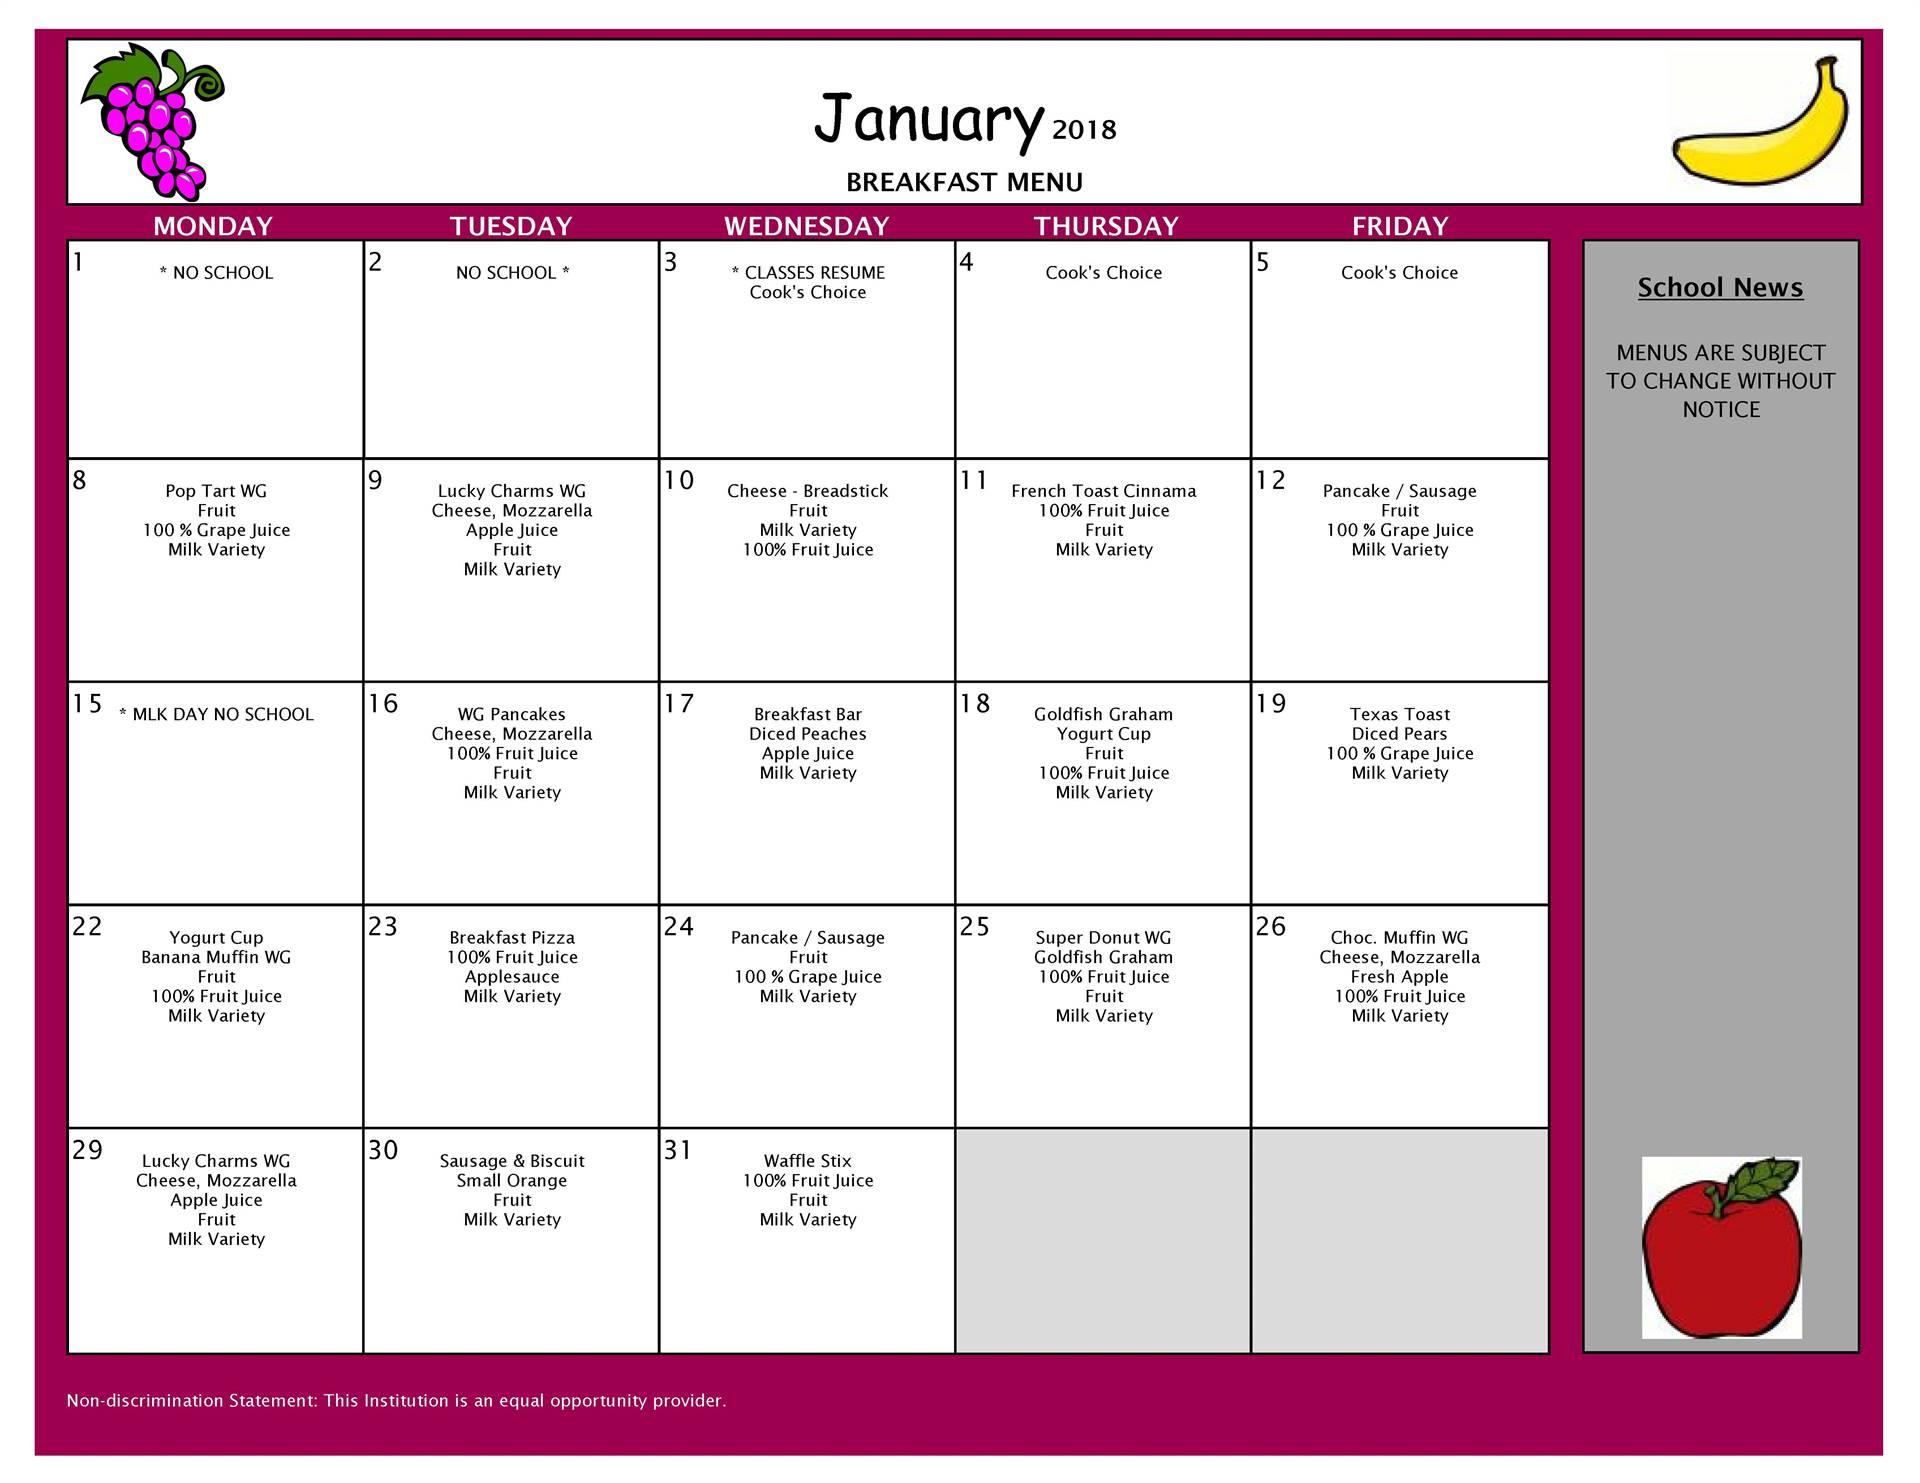 January Breakfast Menu - All Buildings